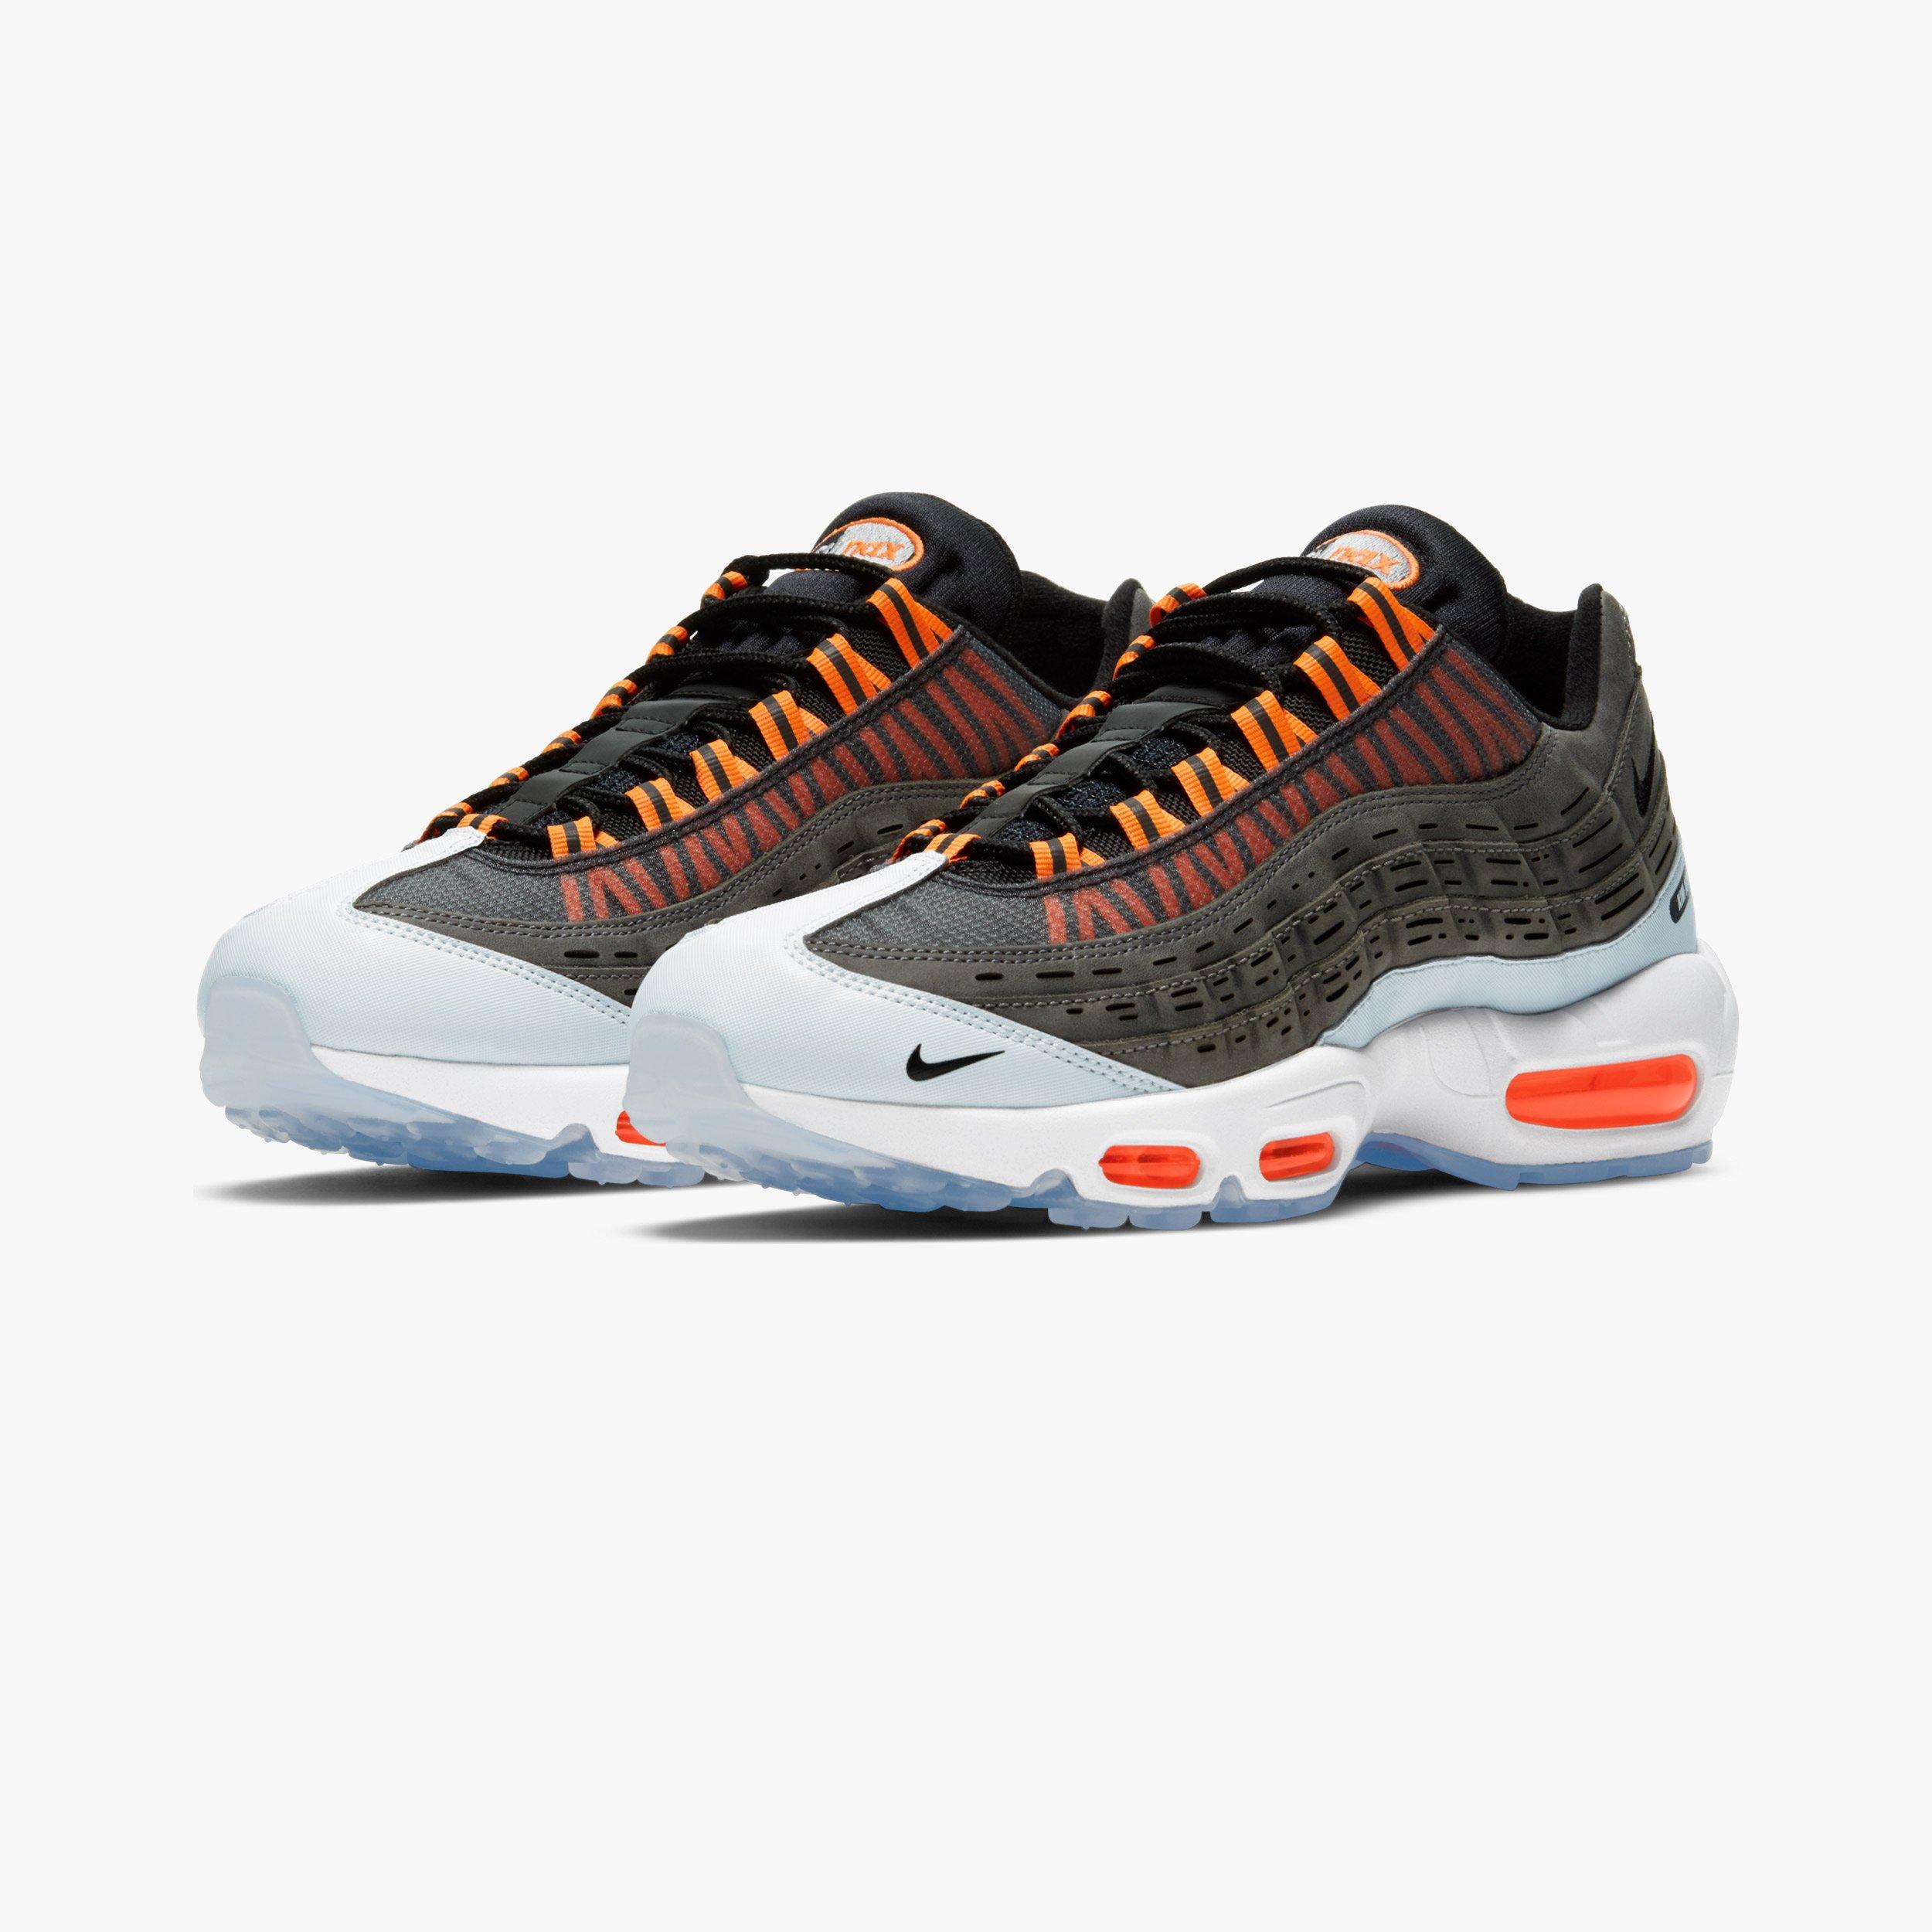 Nike Air Max 95 x Kim Jones - Dd1871-001 - SNS | sneakers ...